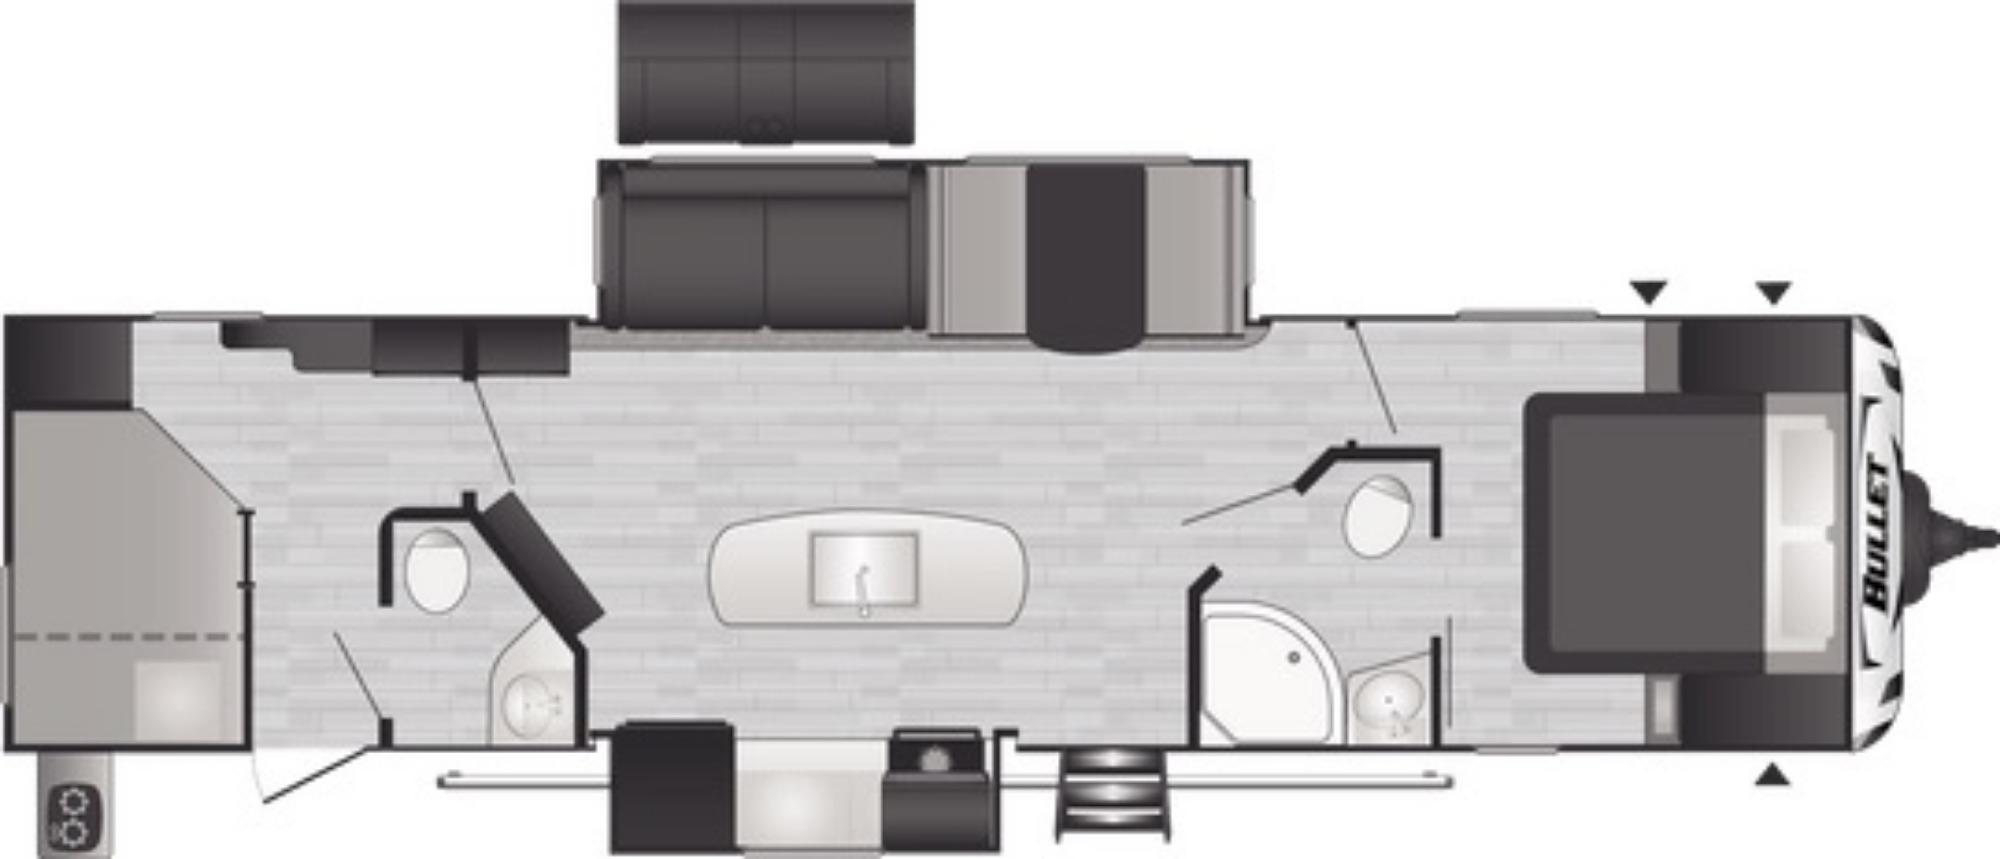 View Floor Plan for 2021 KEYSTONE BULLET 330BHS